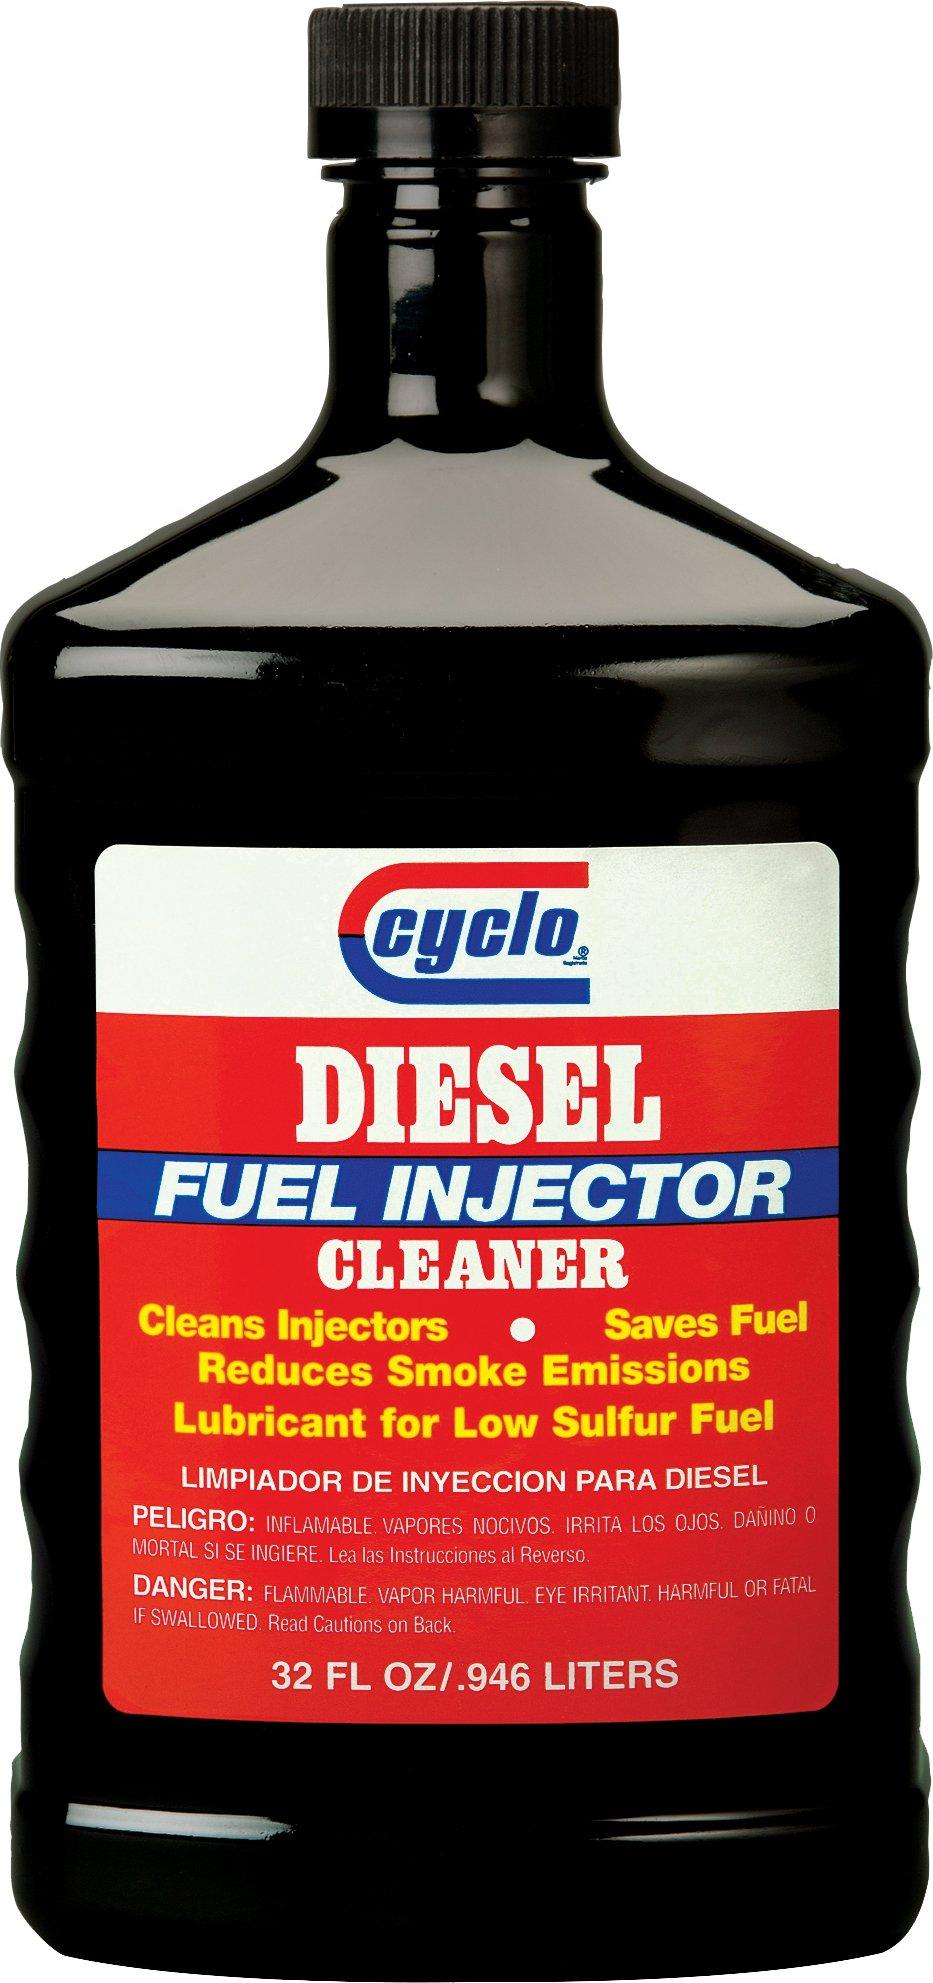 Cyclo - Diesel Fuel Injector Cleaner